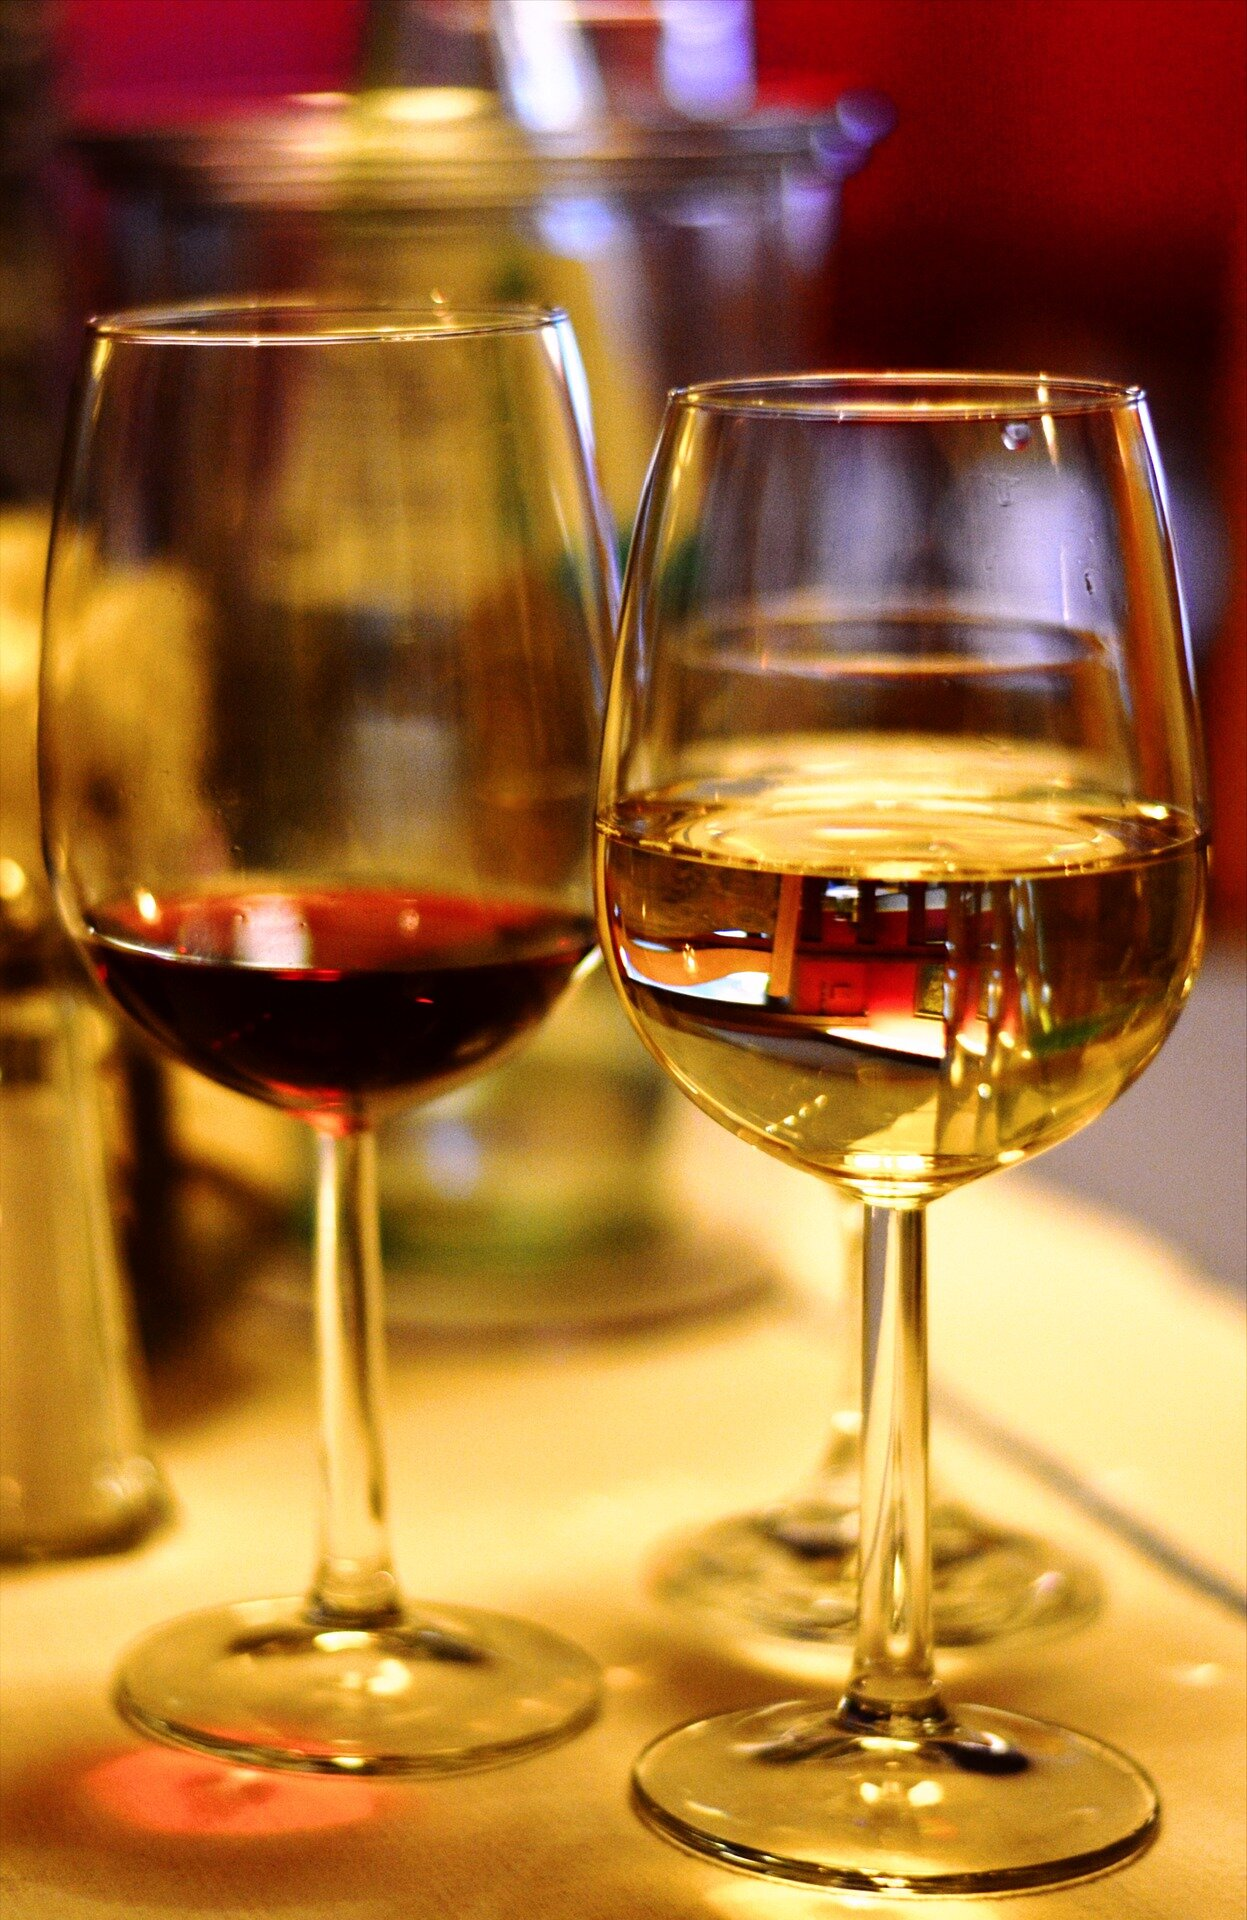 wine-glass-3476970_1920.jpg